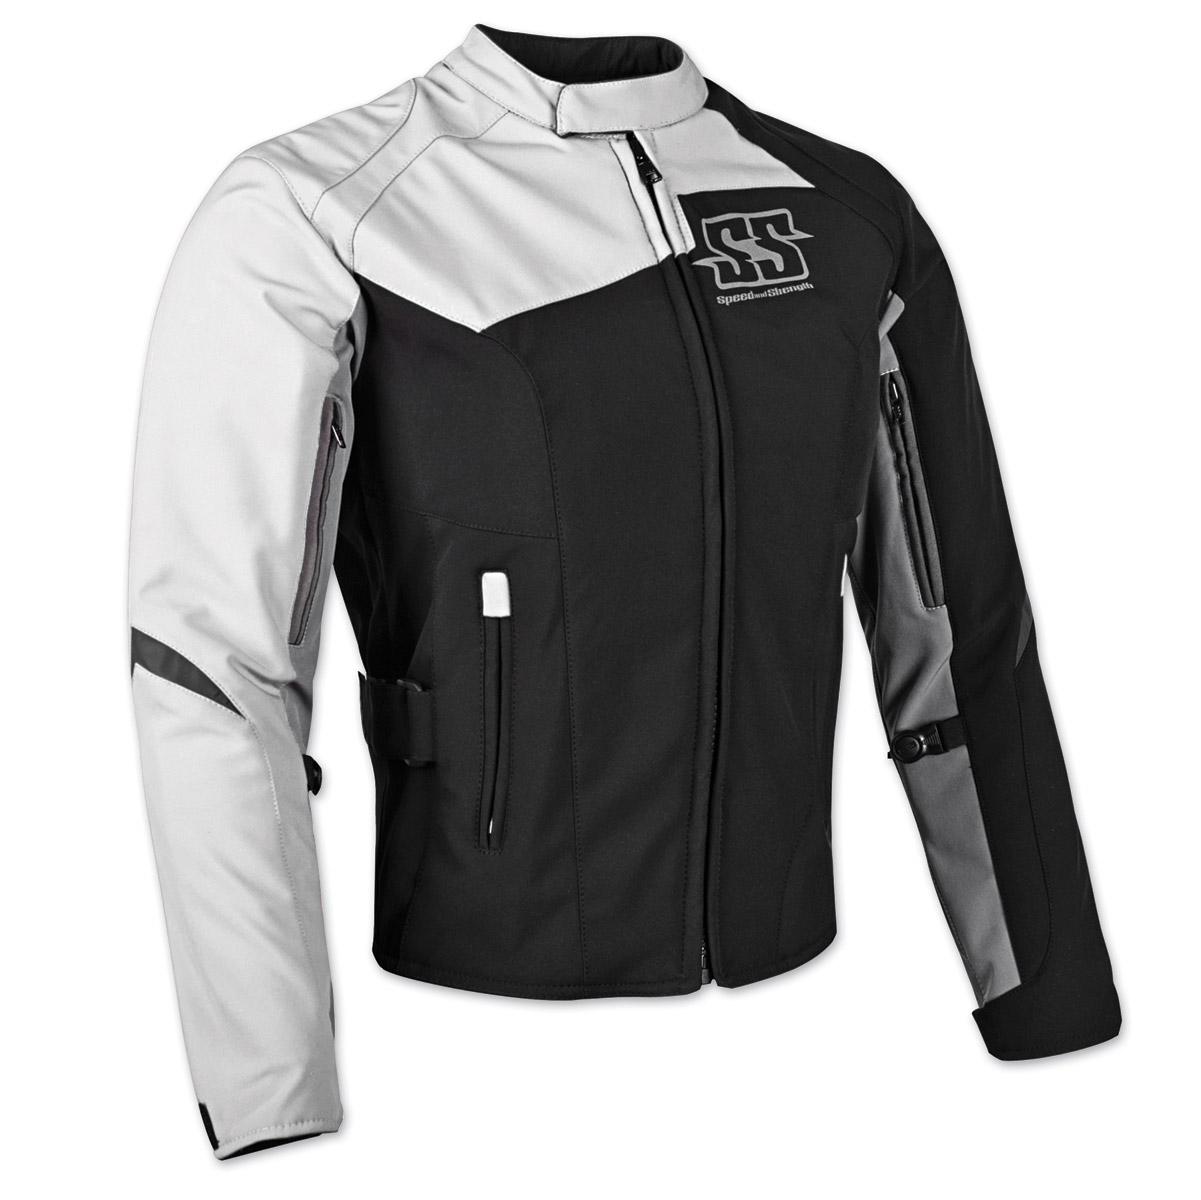 Speed and Strength Women's Back Lash Black/White Textile Jacket